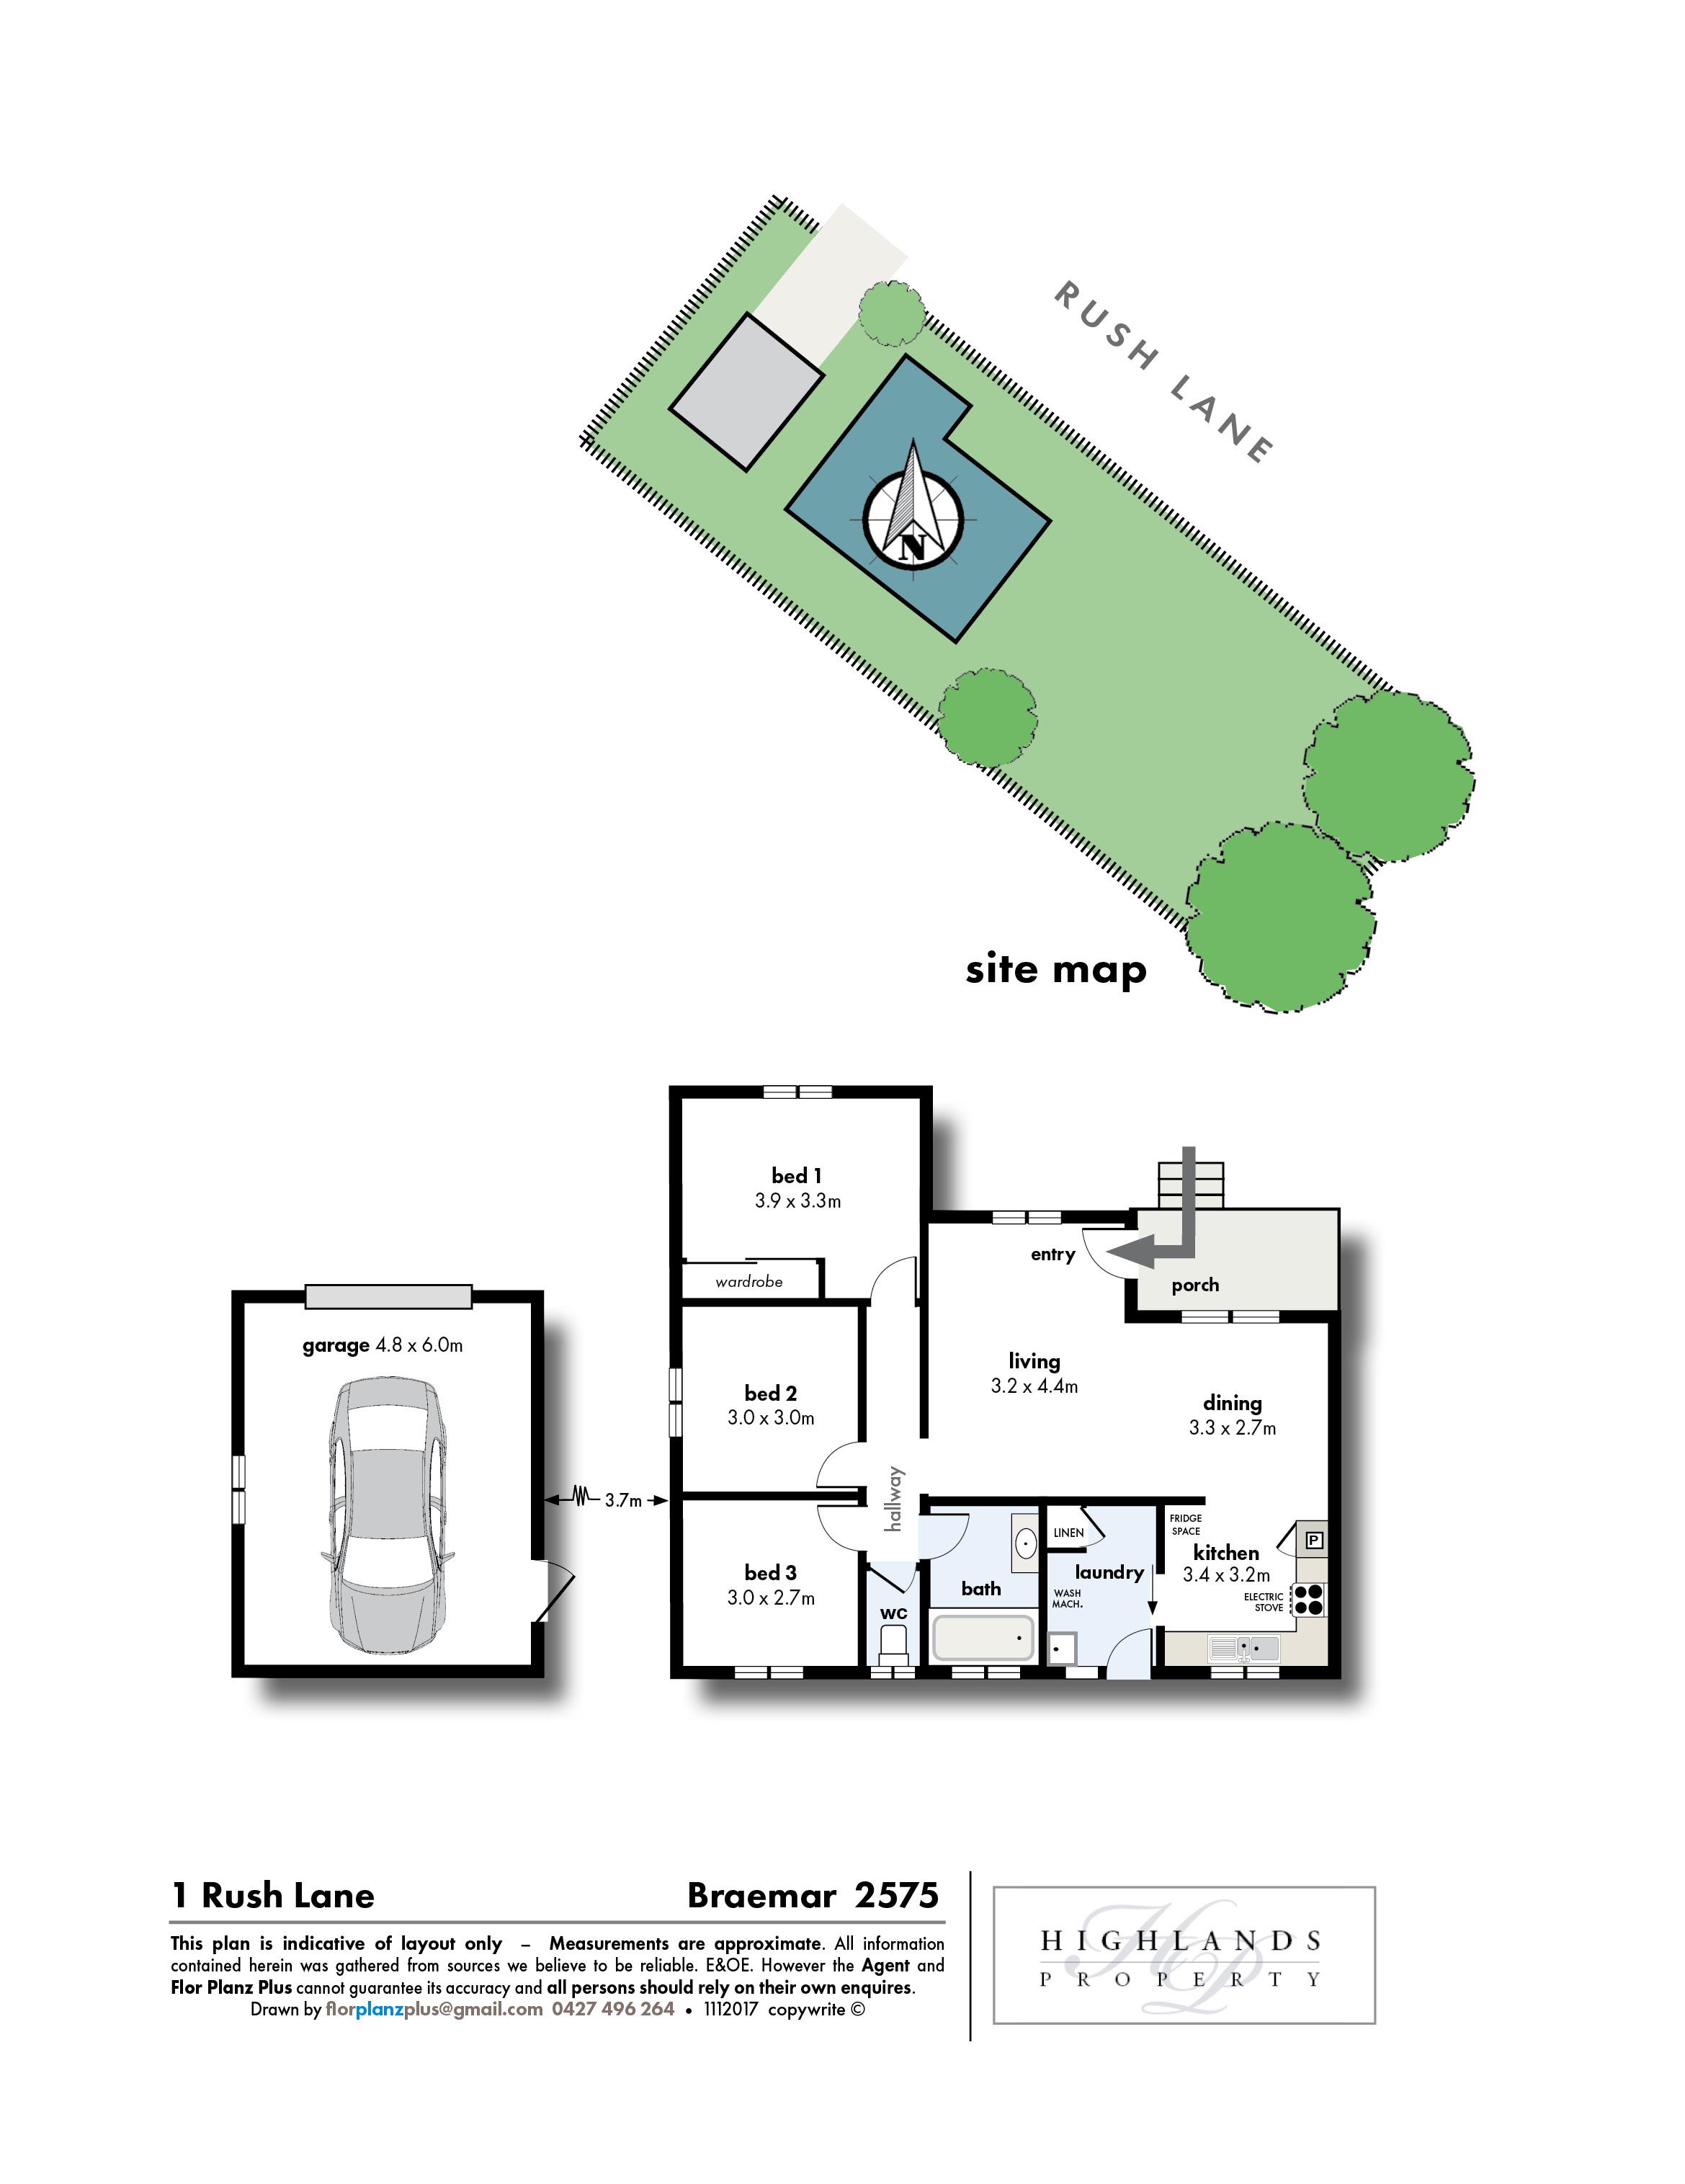 http://assets.boxdice.com.au/highlands/listings/1126/90925763.jpg